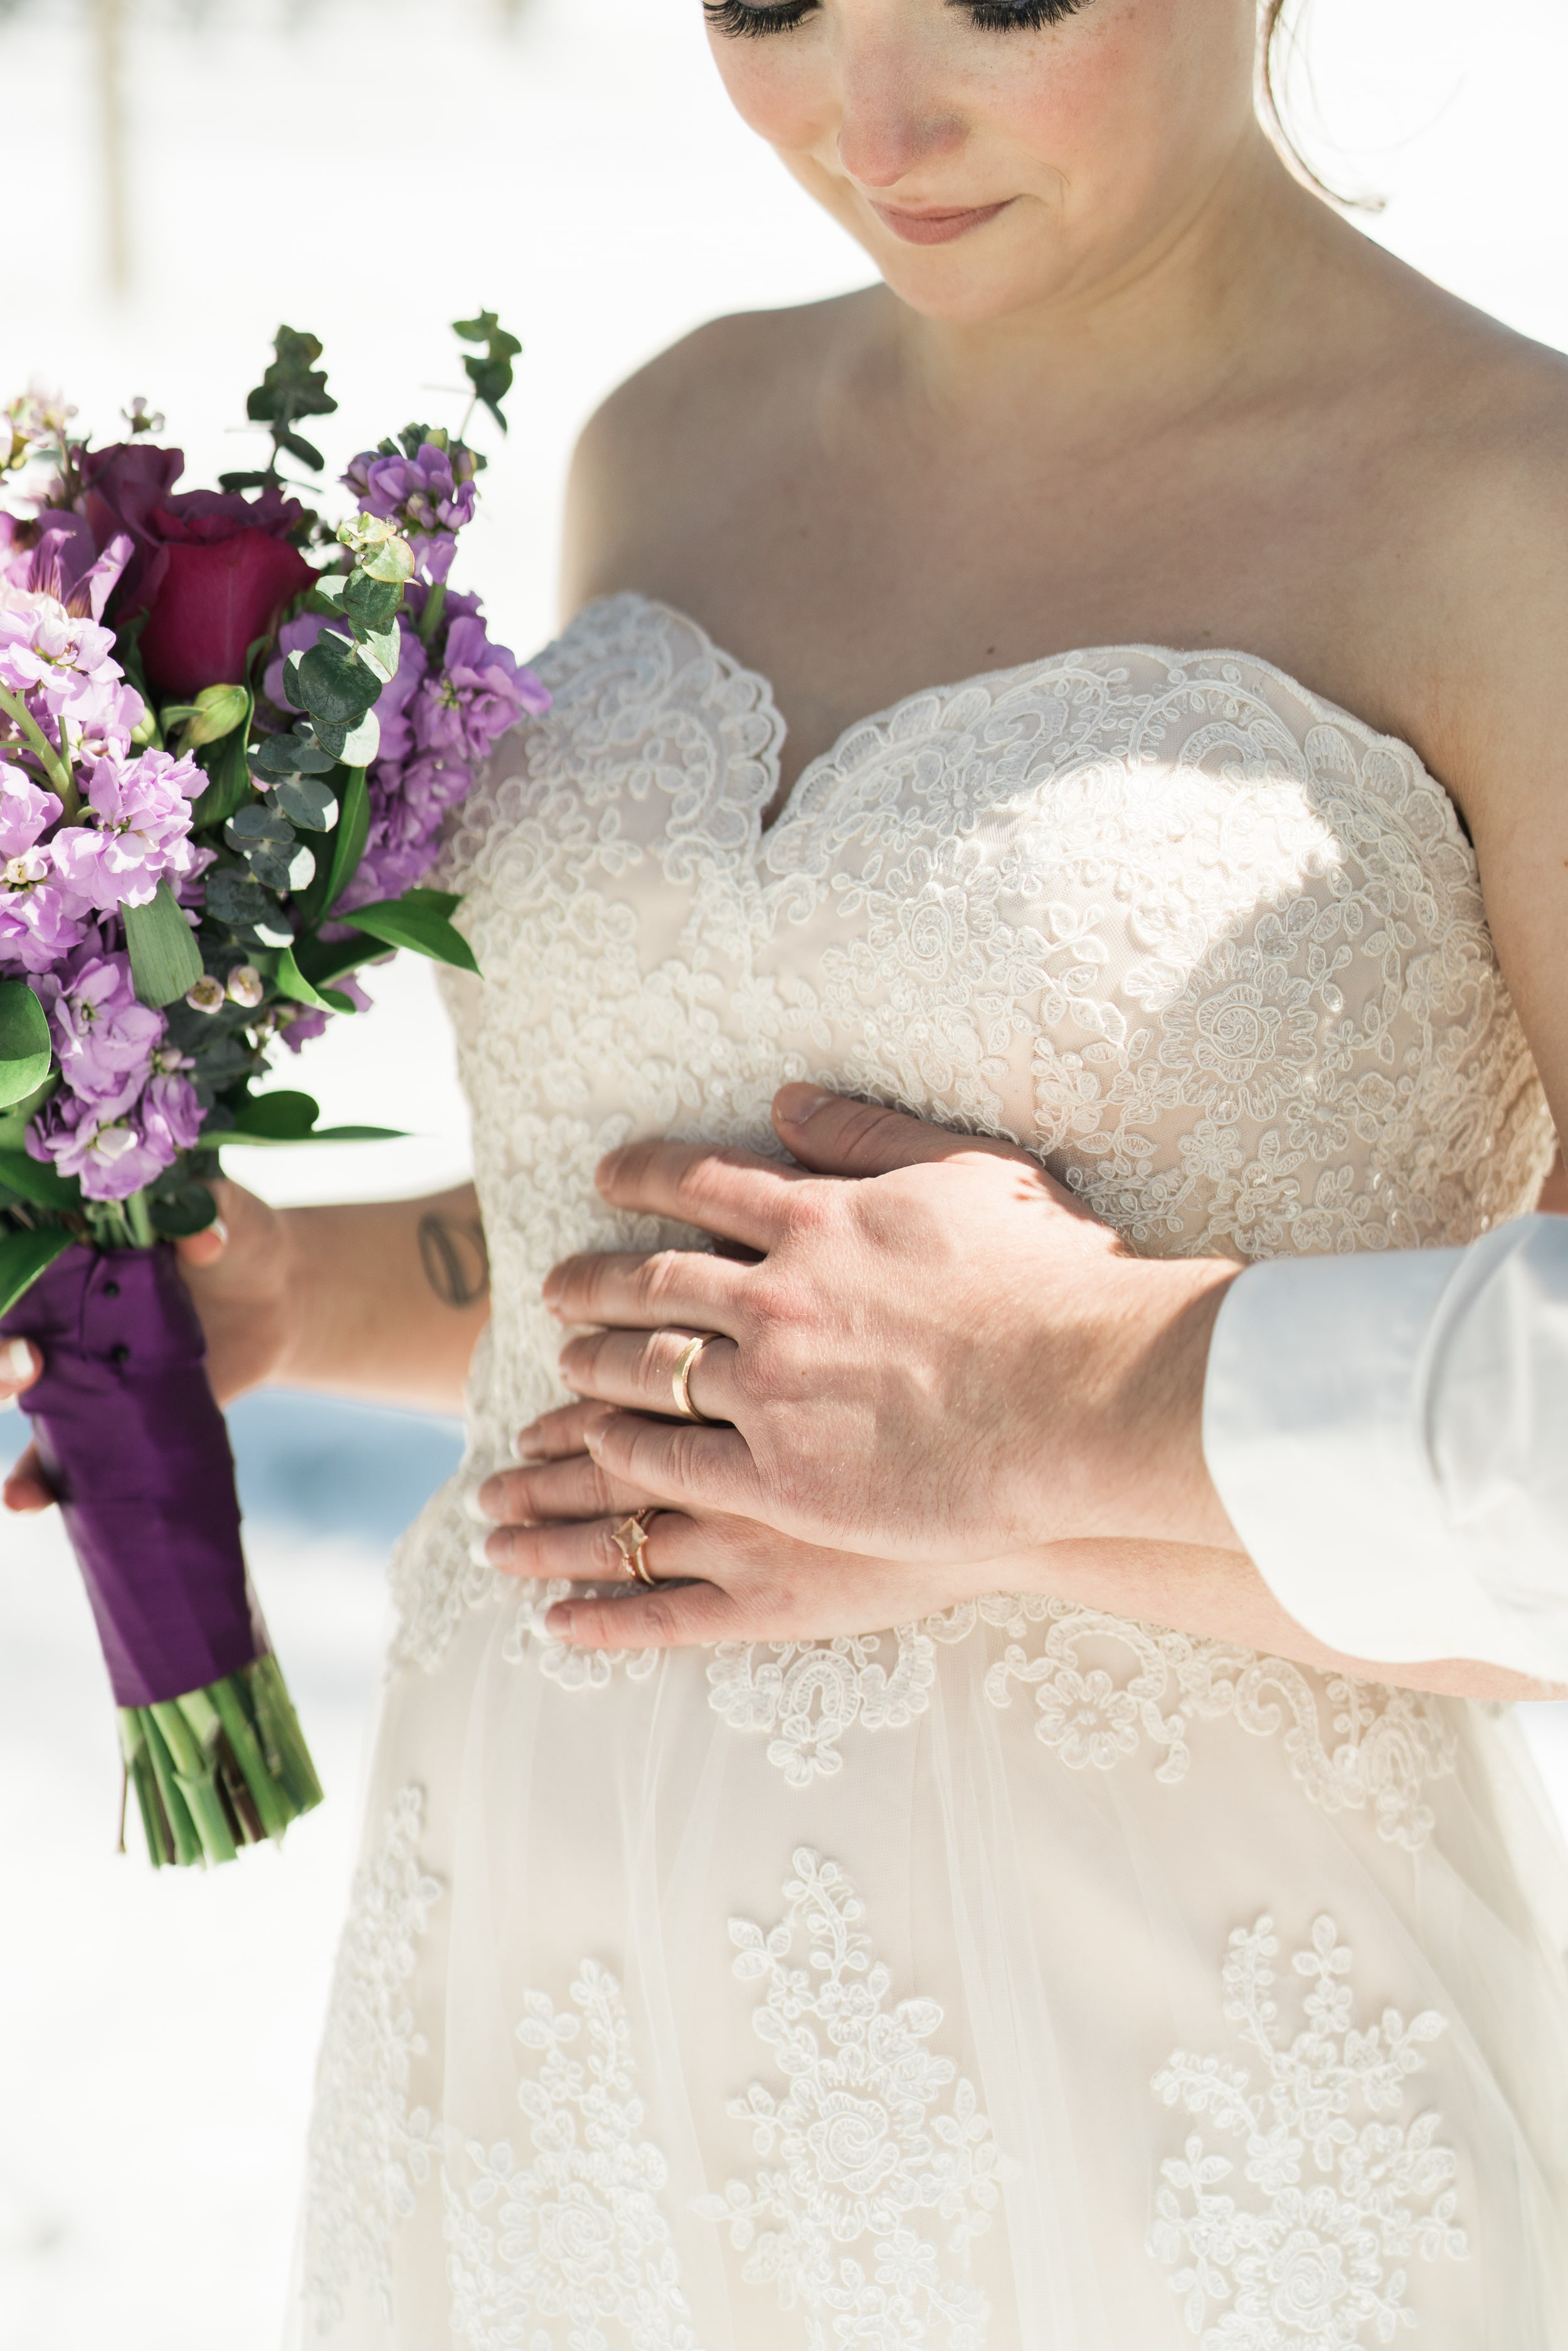 snowy-intimate-wedding-19.jpg